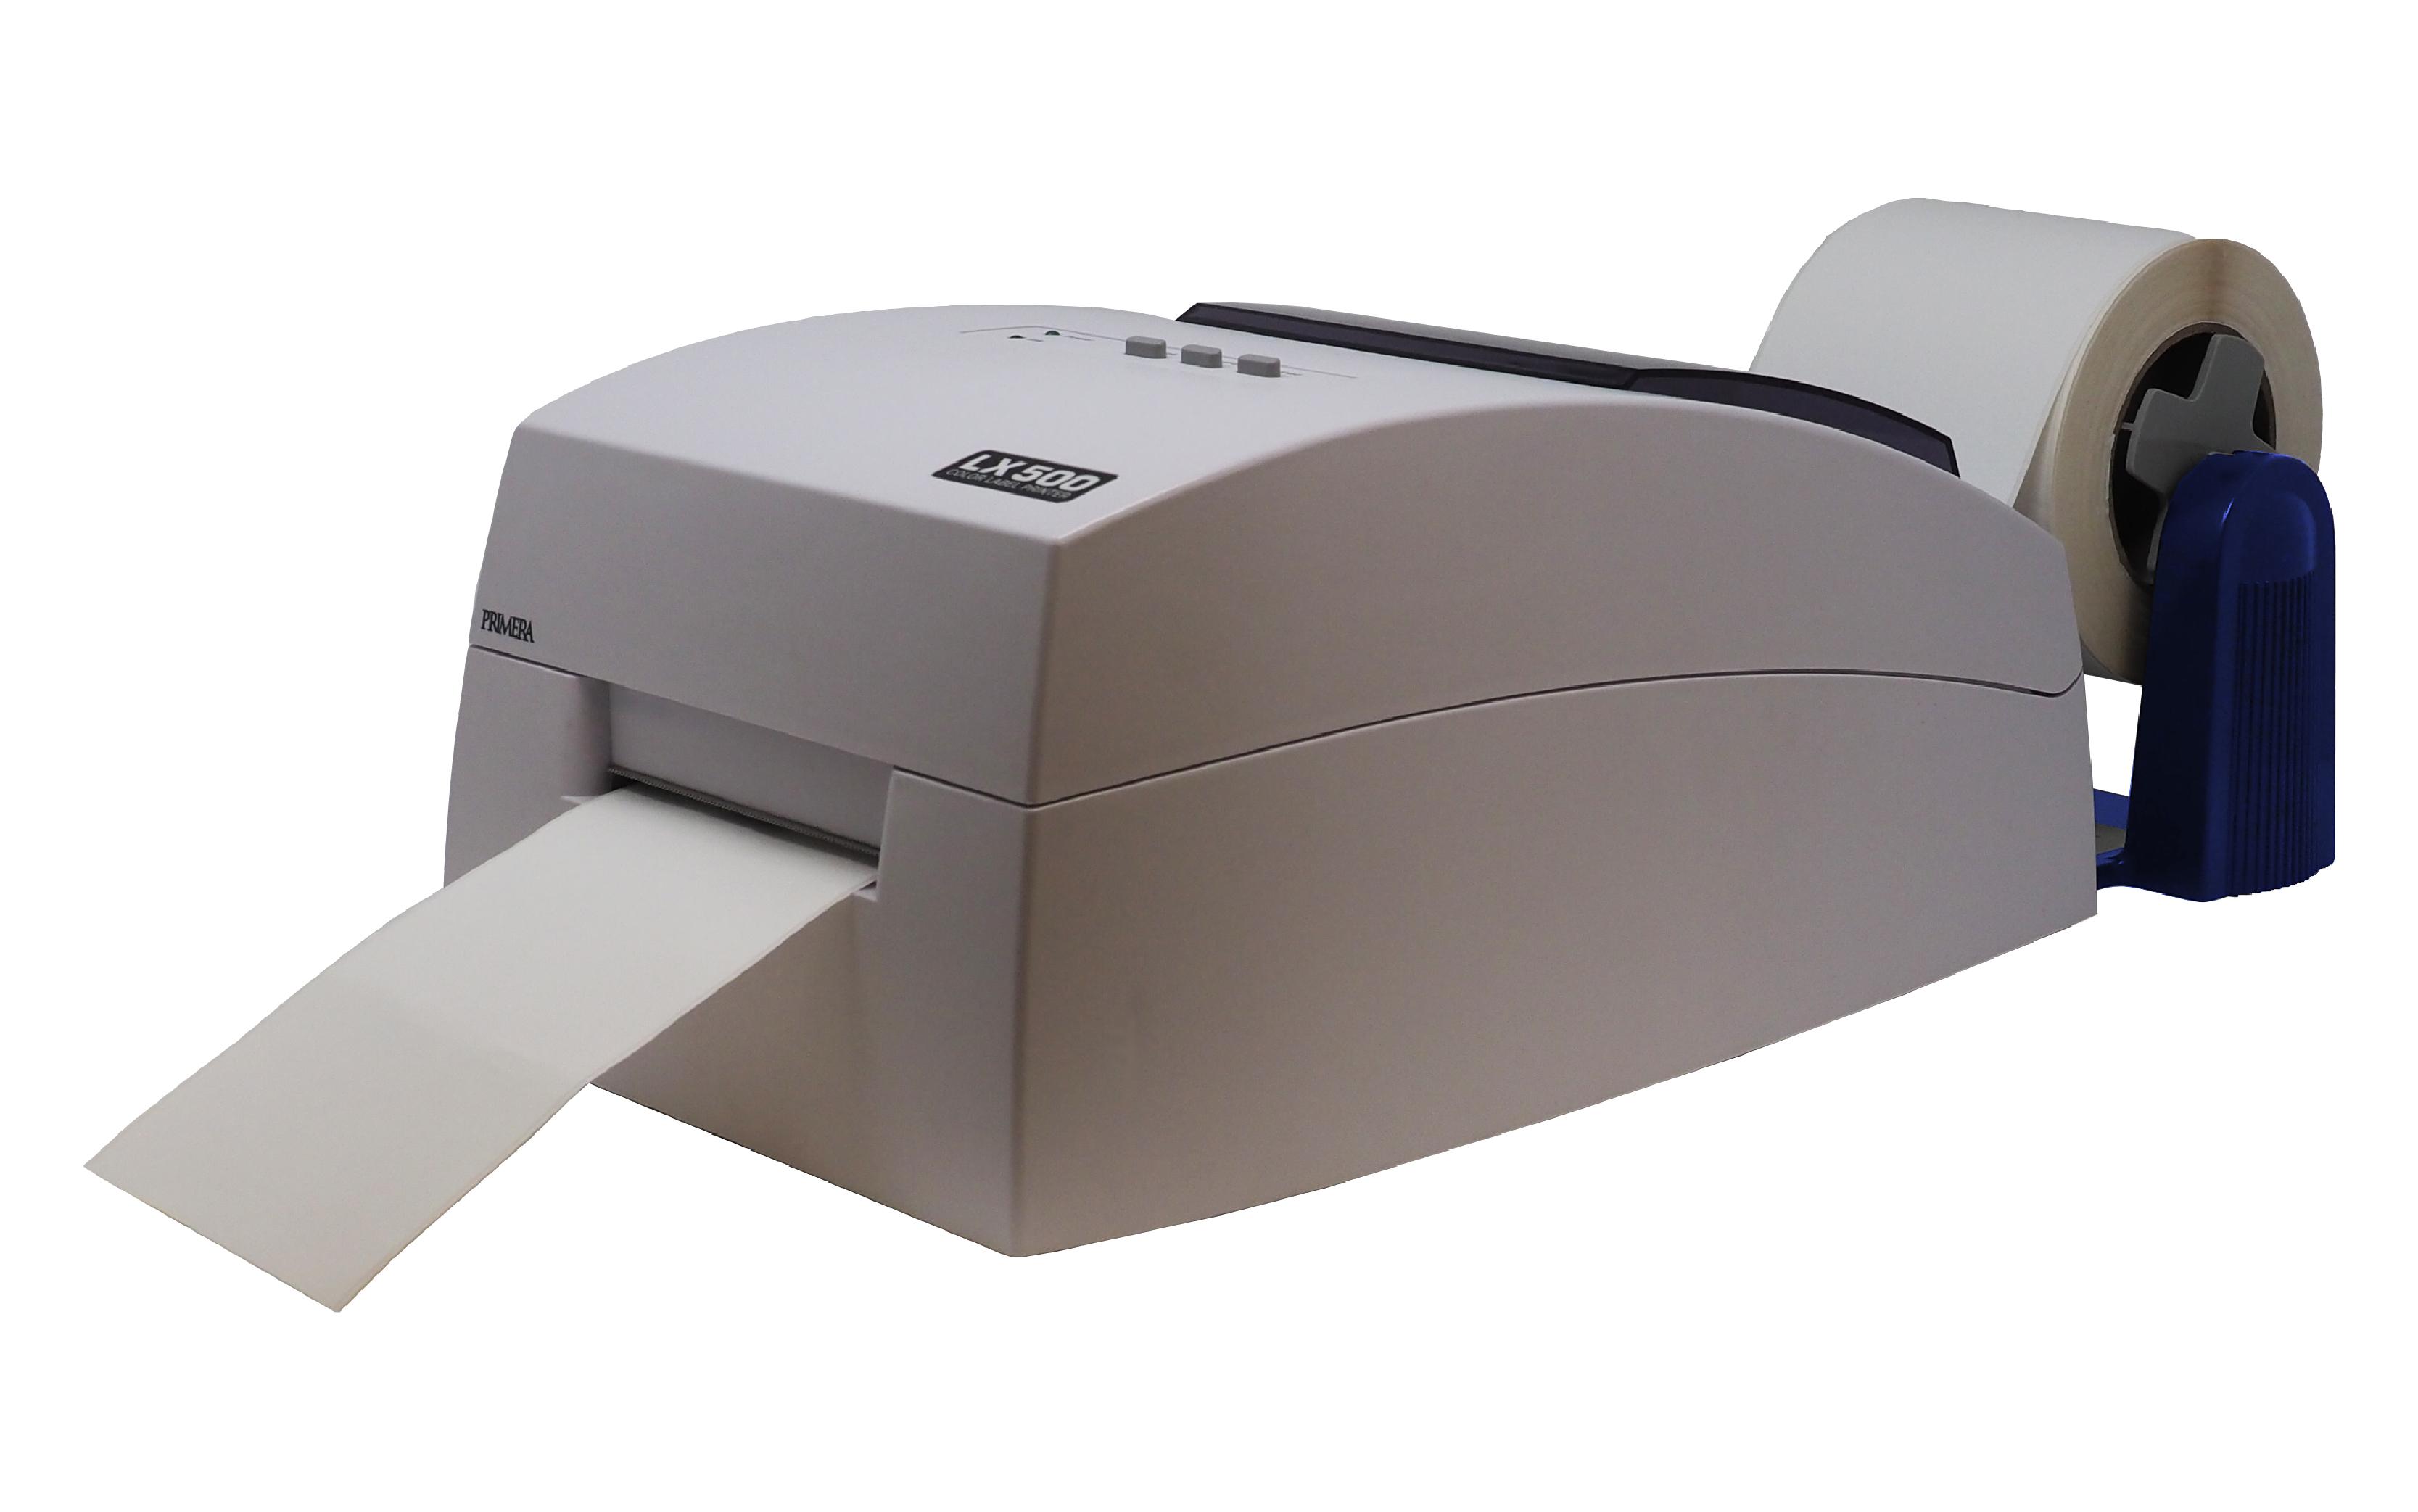 Primera LX500 printer with external label unwinder